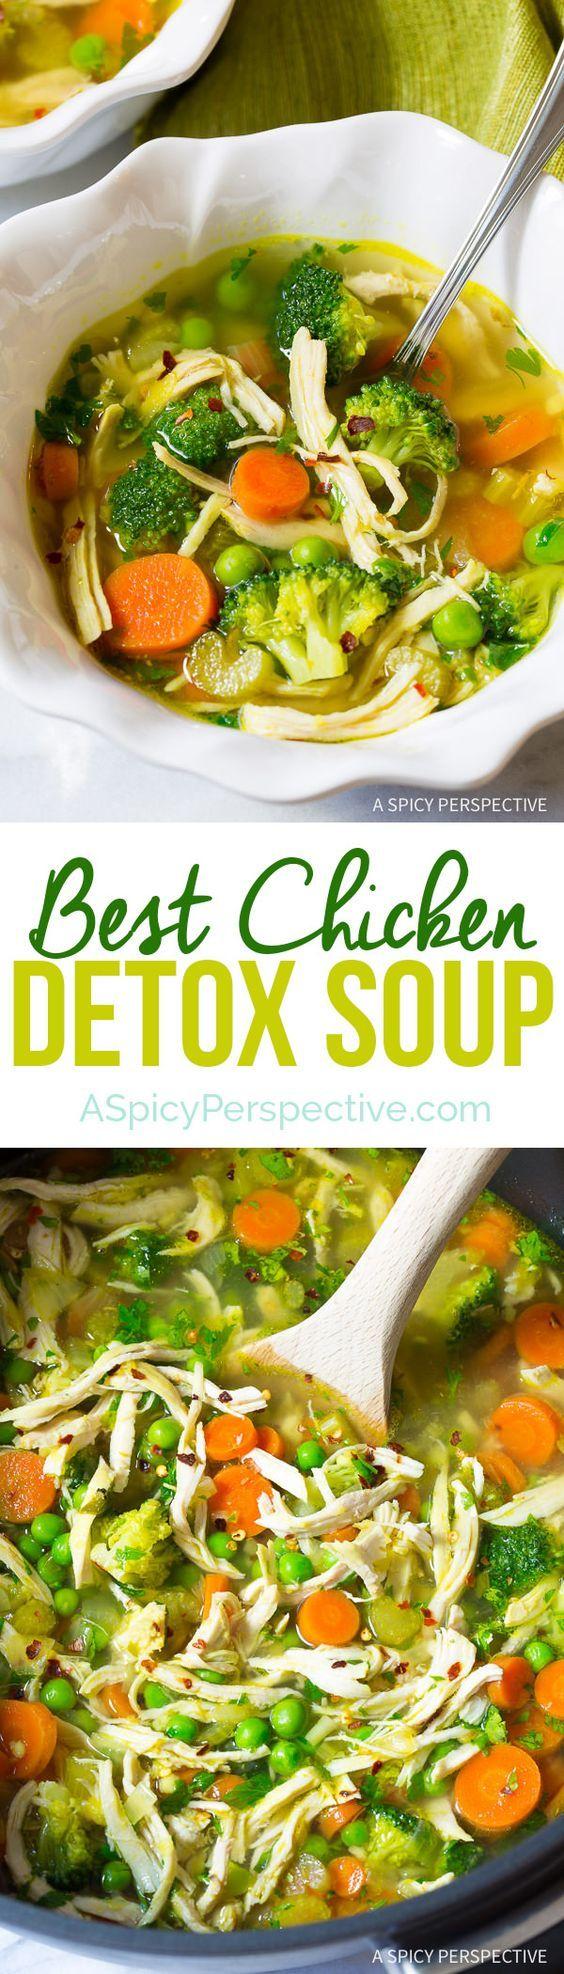 Best Ever Chicken Detox Soup Recipe & Cleanse | ASpicyPerspective.com (Paleo, Gluten Free, Dairy Free):